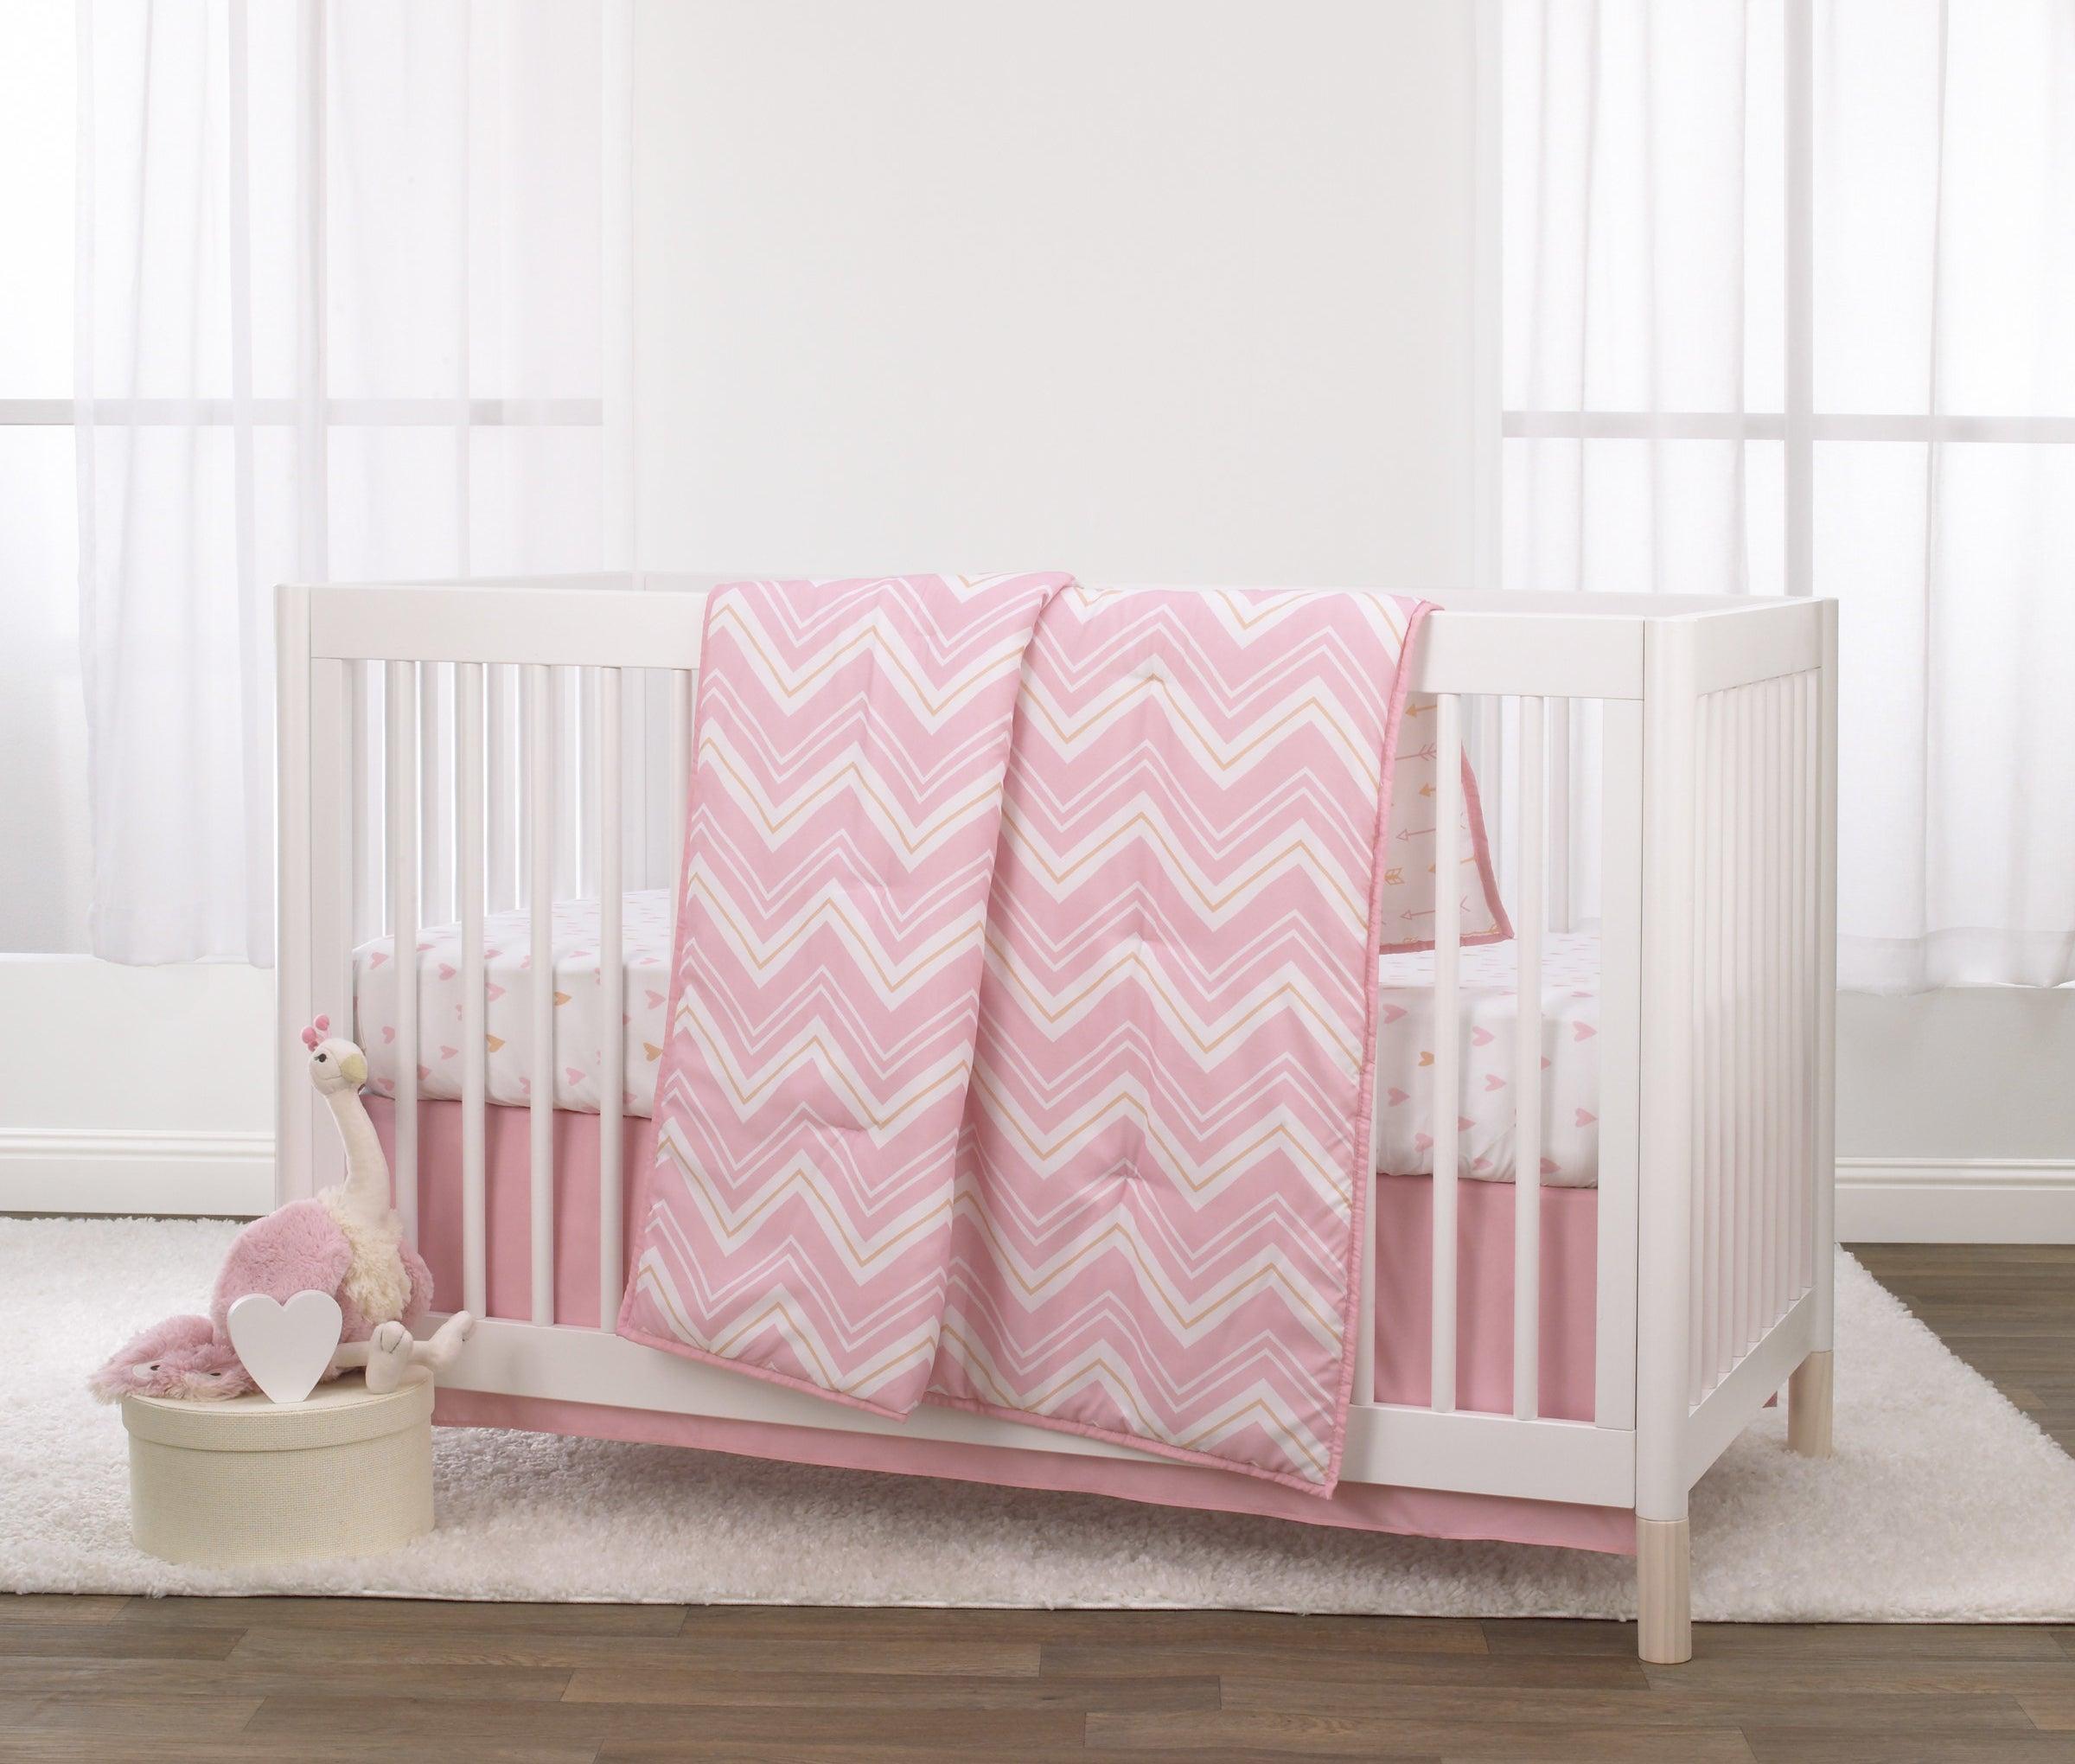 the pink bedding set